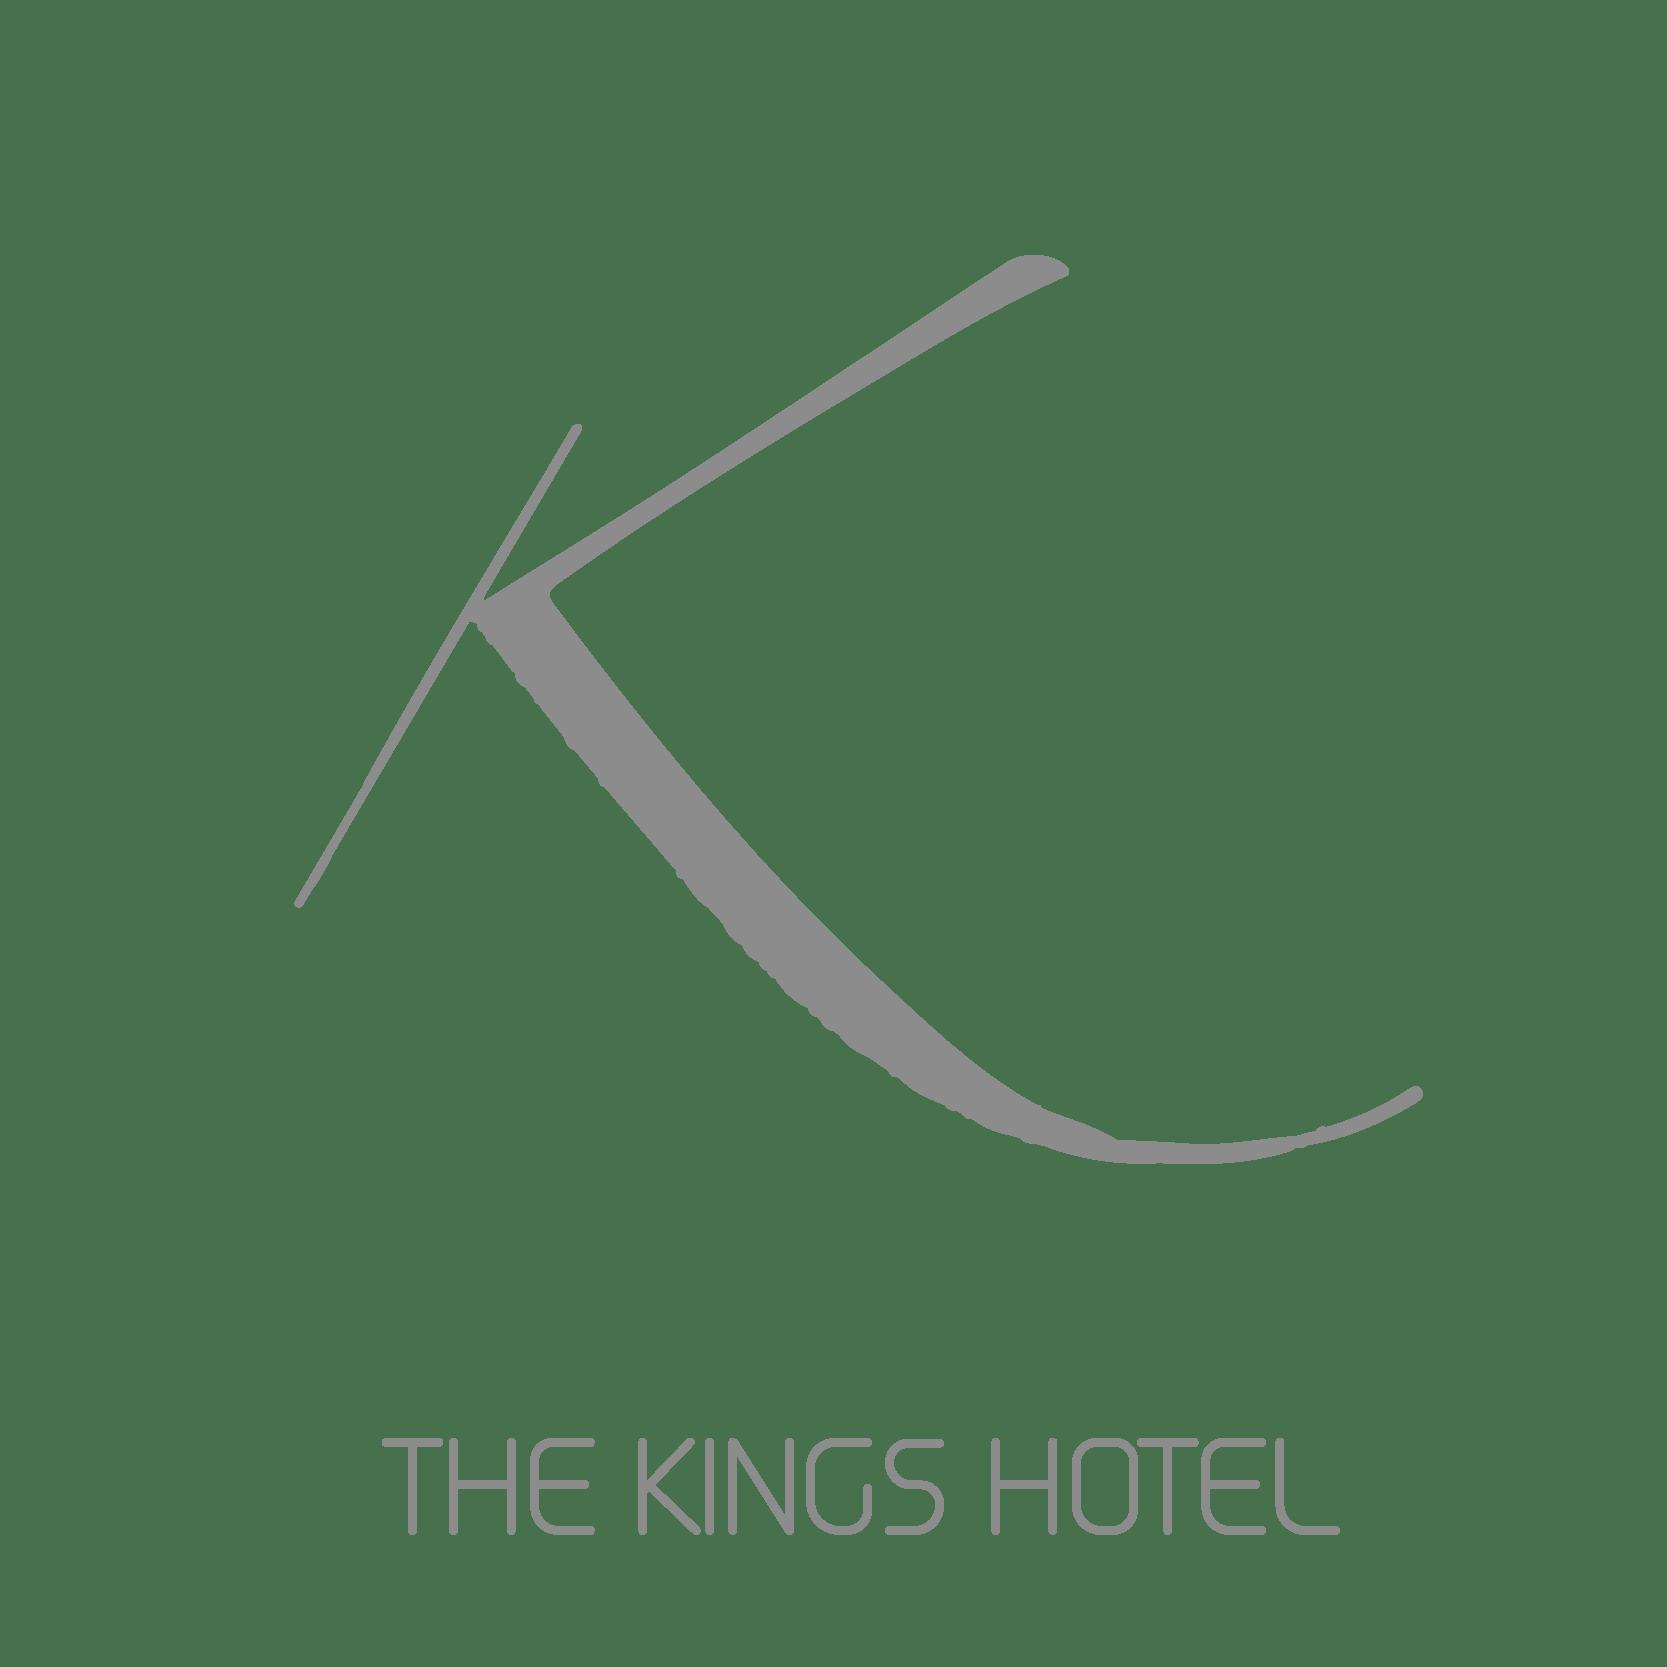 KingsHotel-01-min